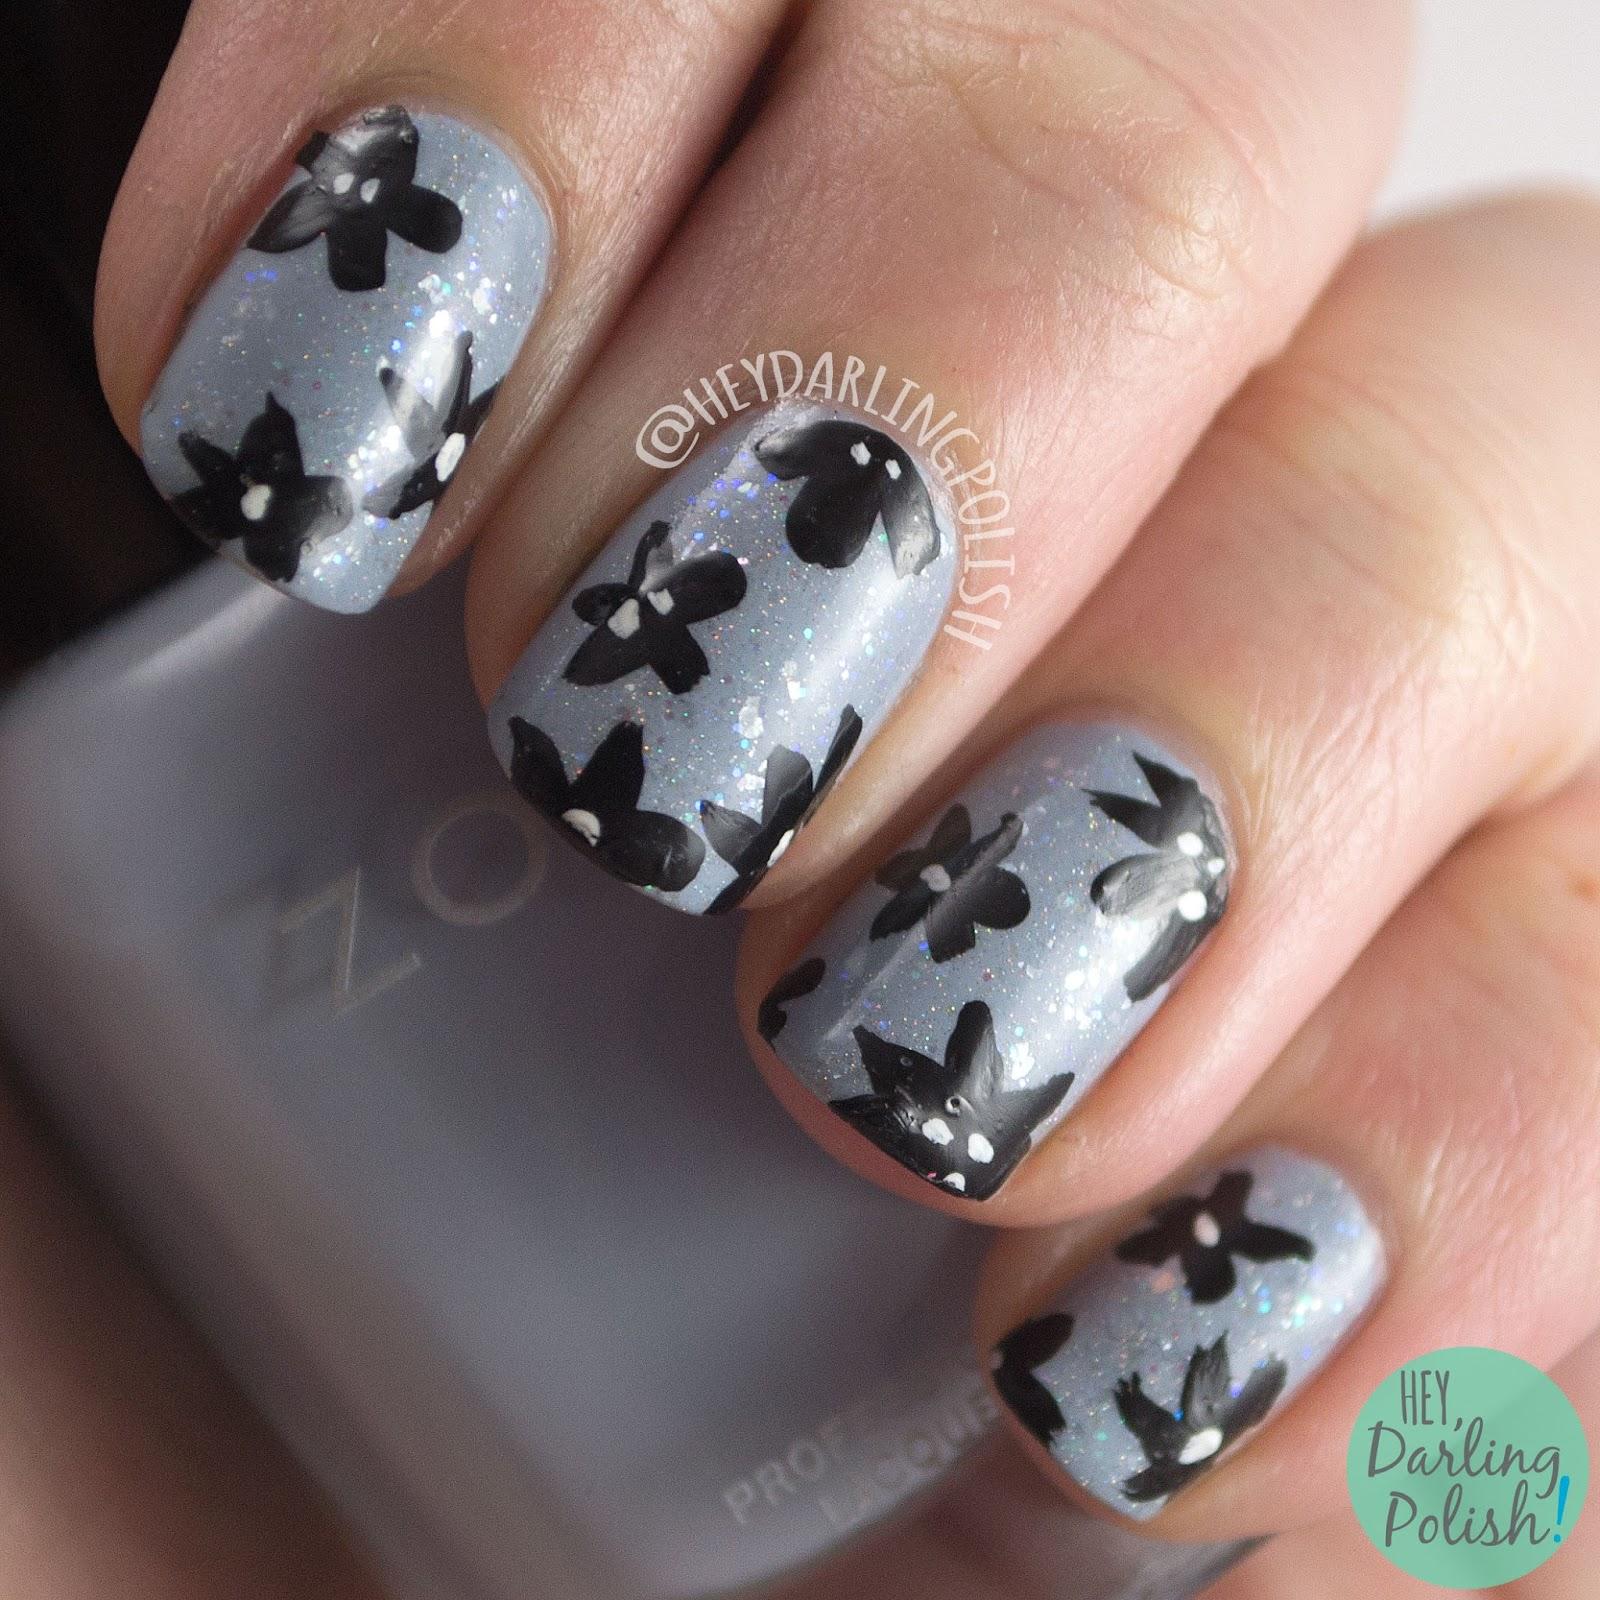 nails, nail art, nail polish, blue, flowers, floral, black, sparkle, hey darling polish, 52 week challenge